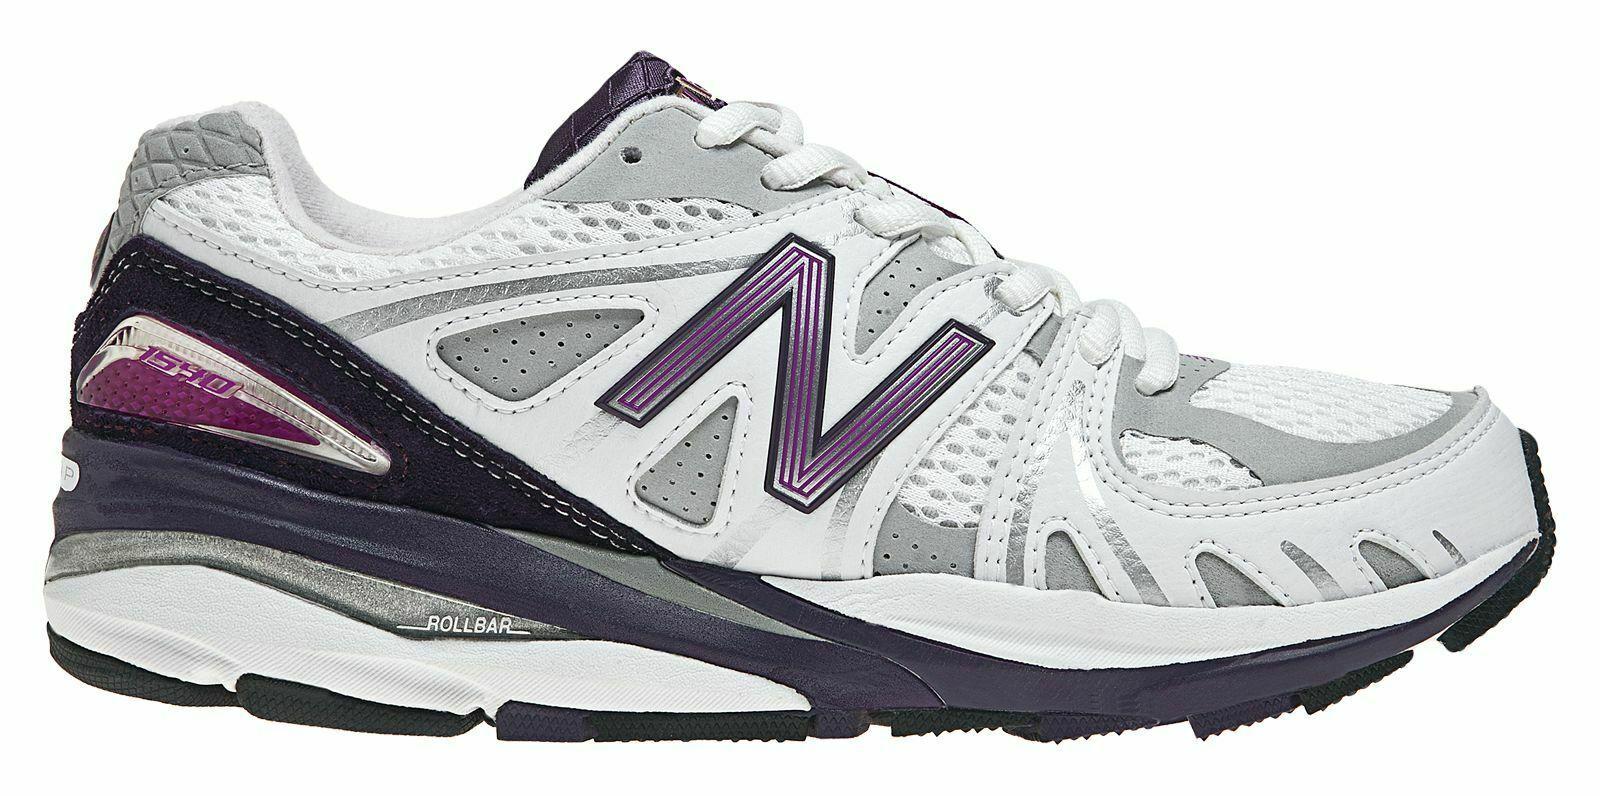 Minimalist shoes